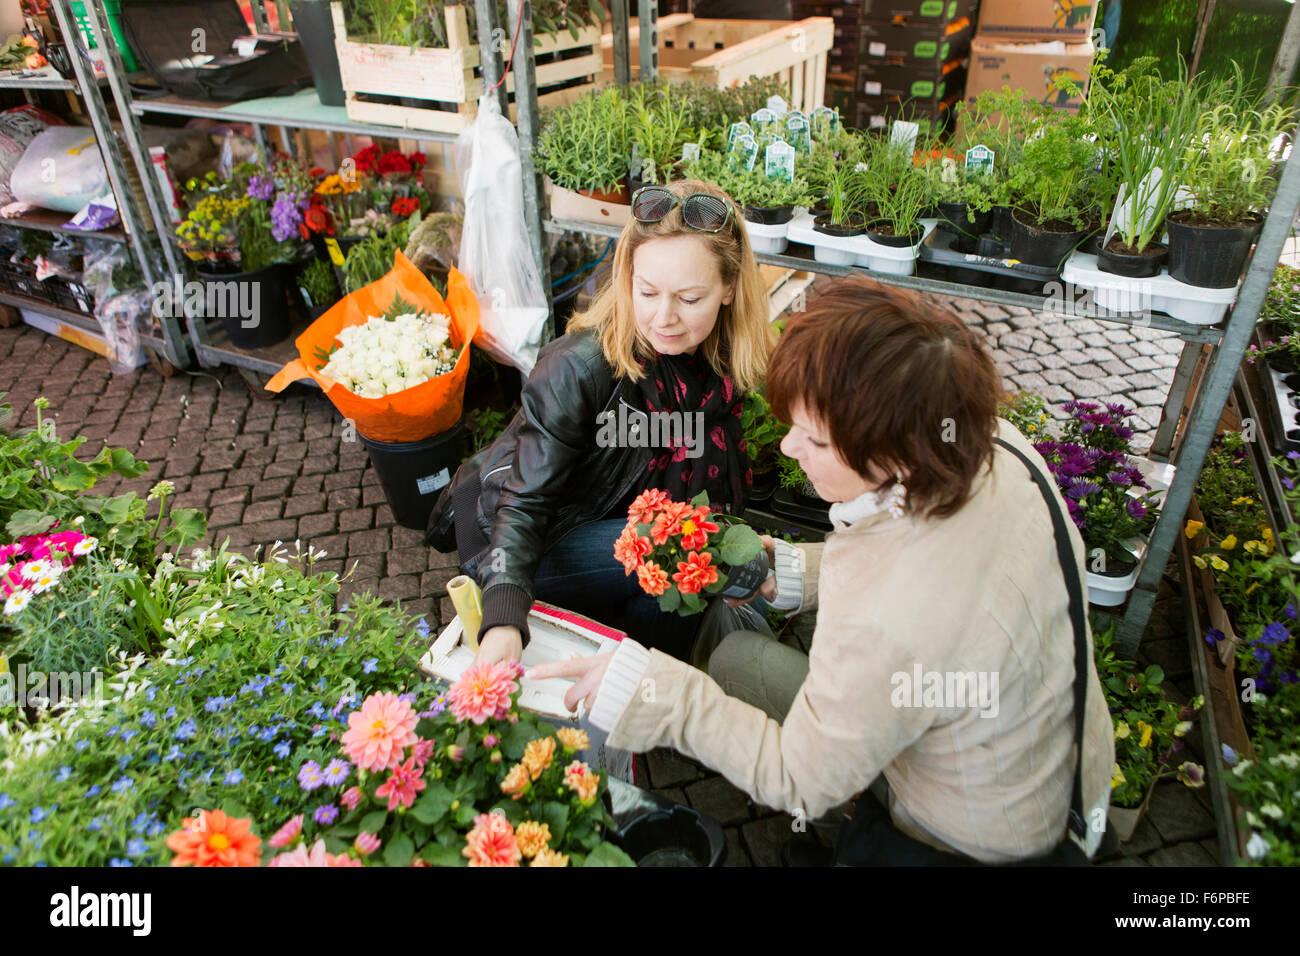 Mature women buying flower plants in nursery - Stock Image